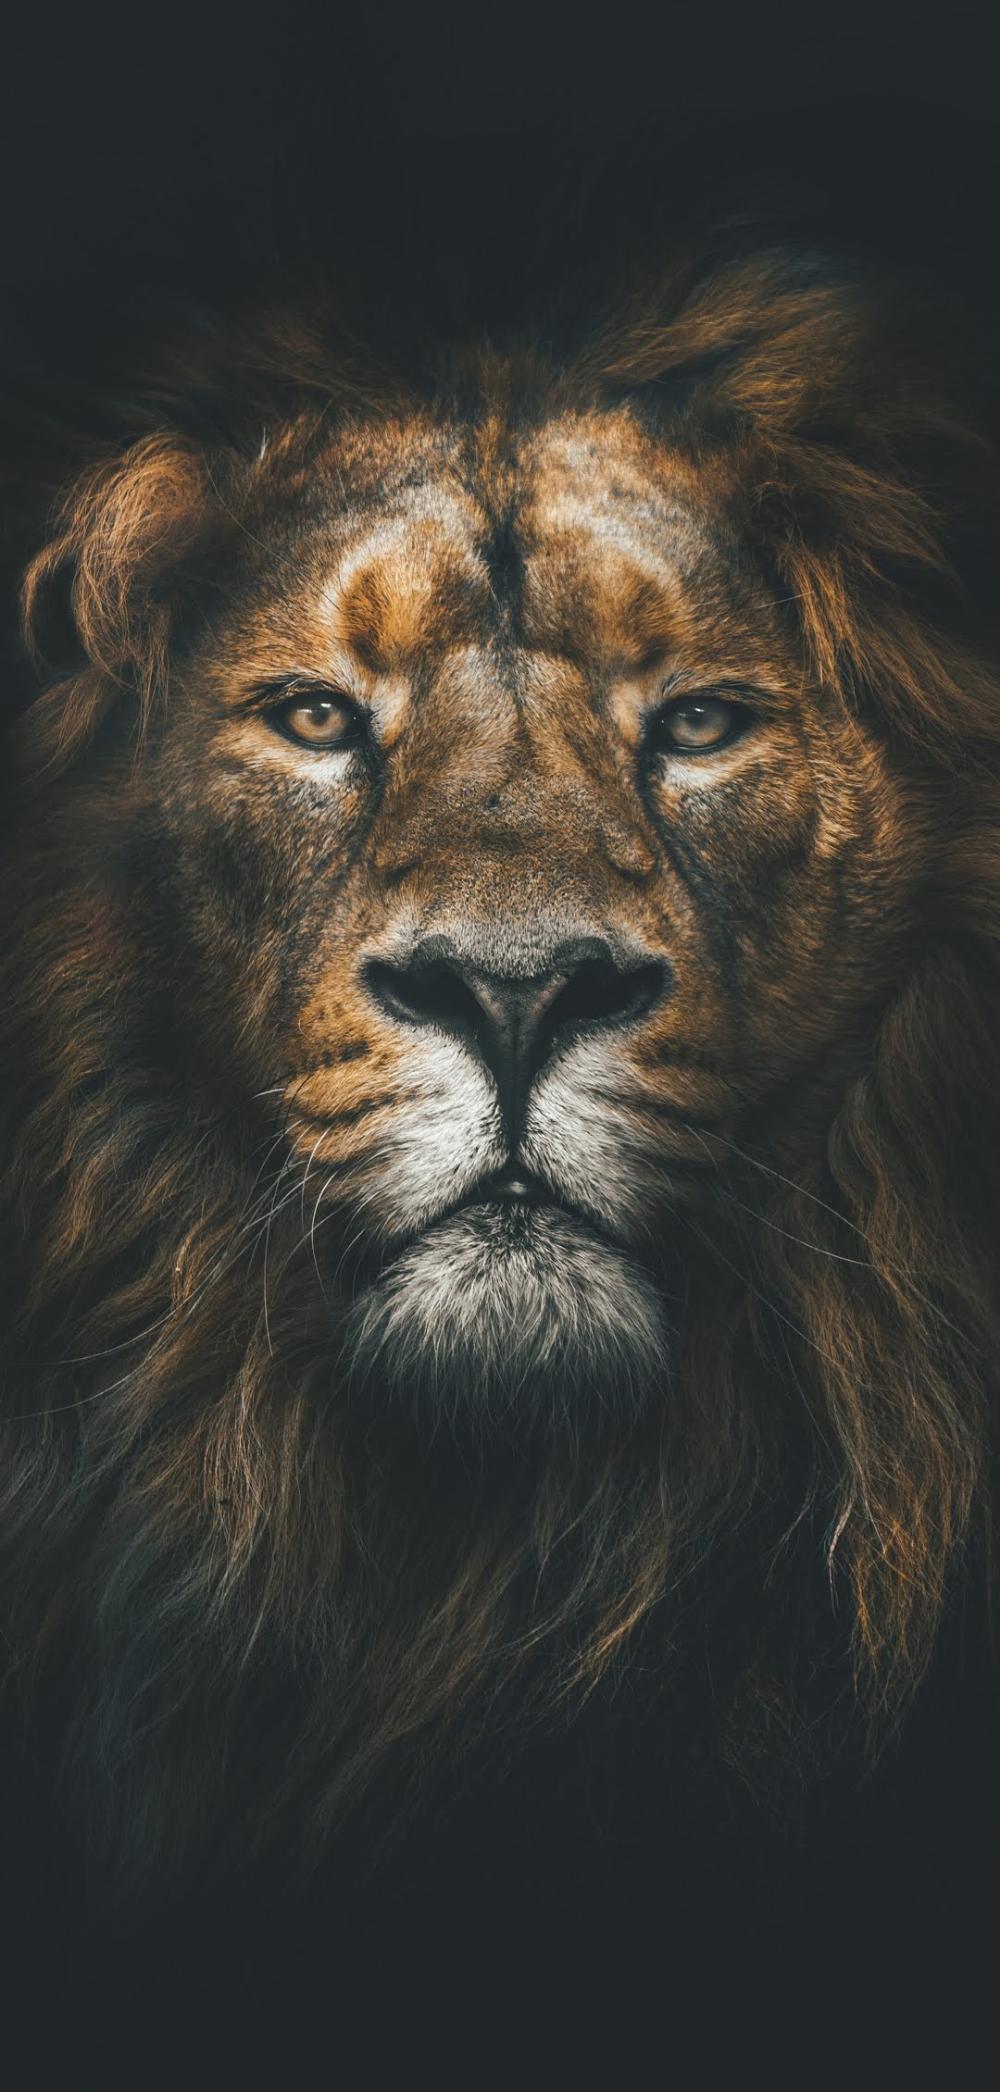 Lion Wallpaper Hd Pets Collection Laginate Leao Papel De Parede Fotografia De Leao Tribo De Juda